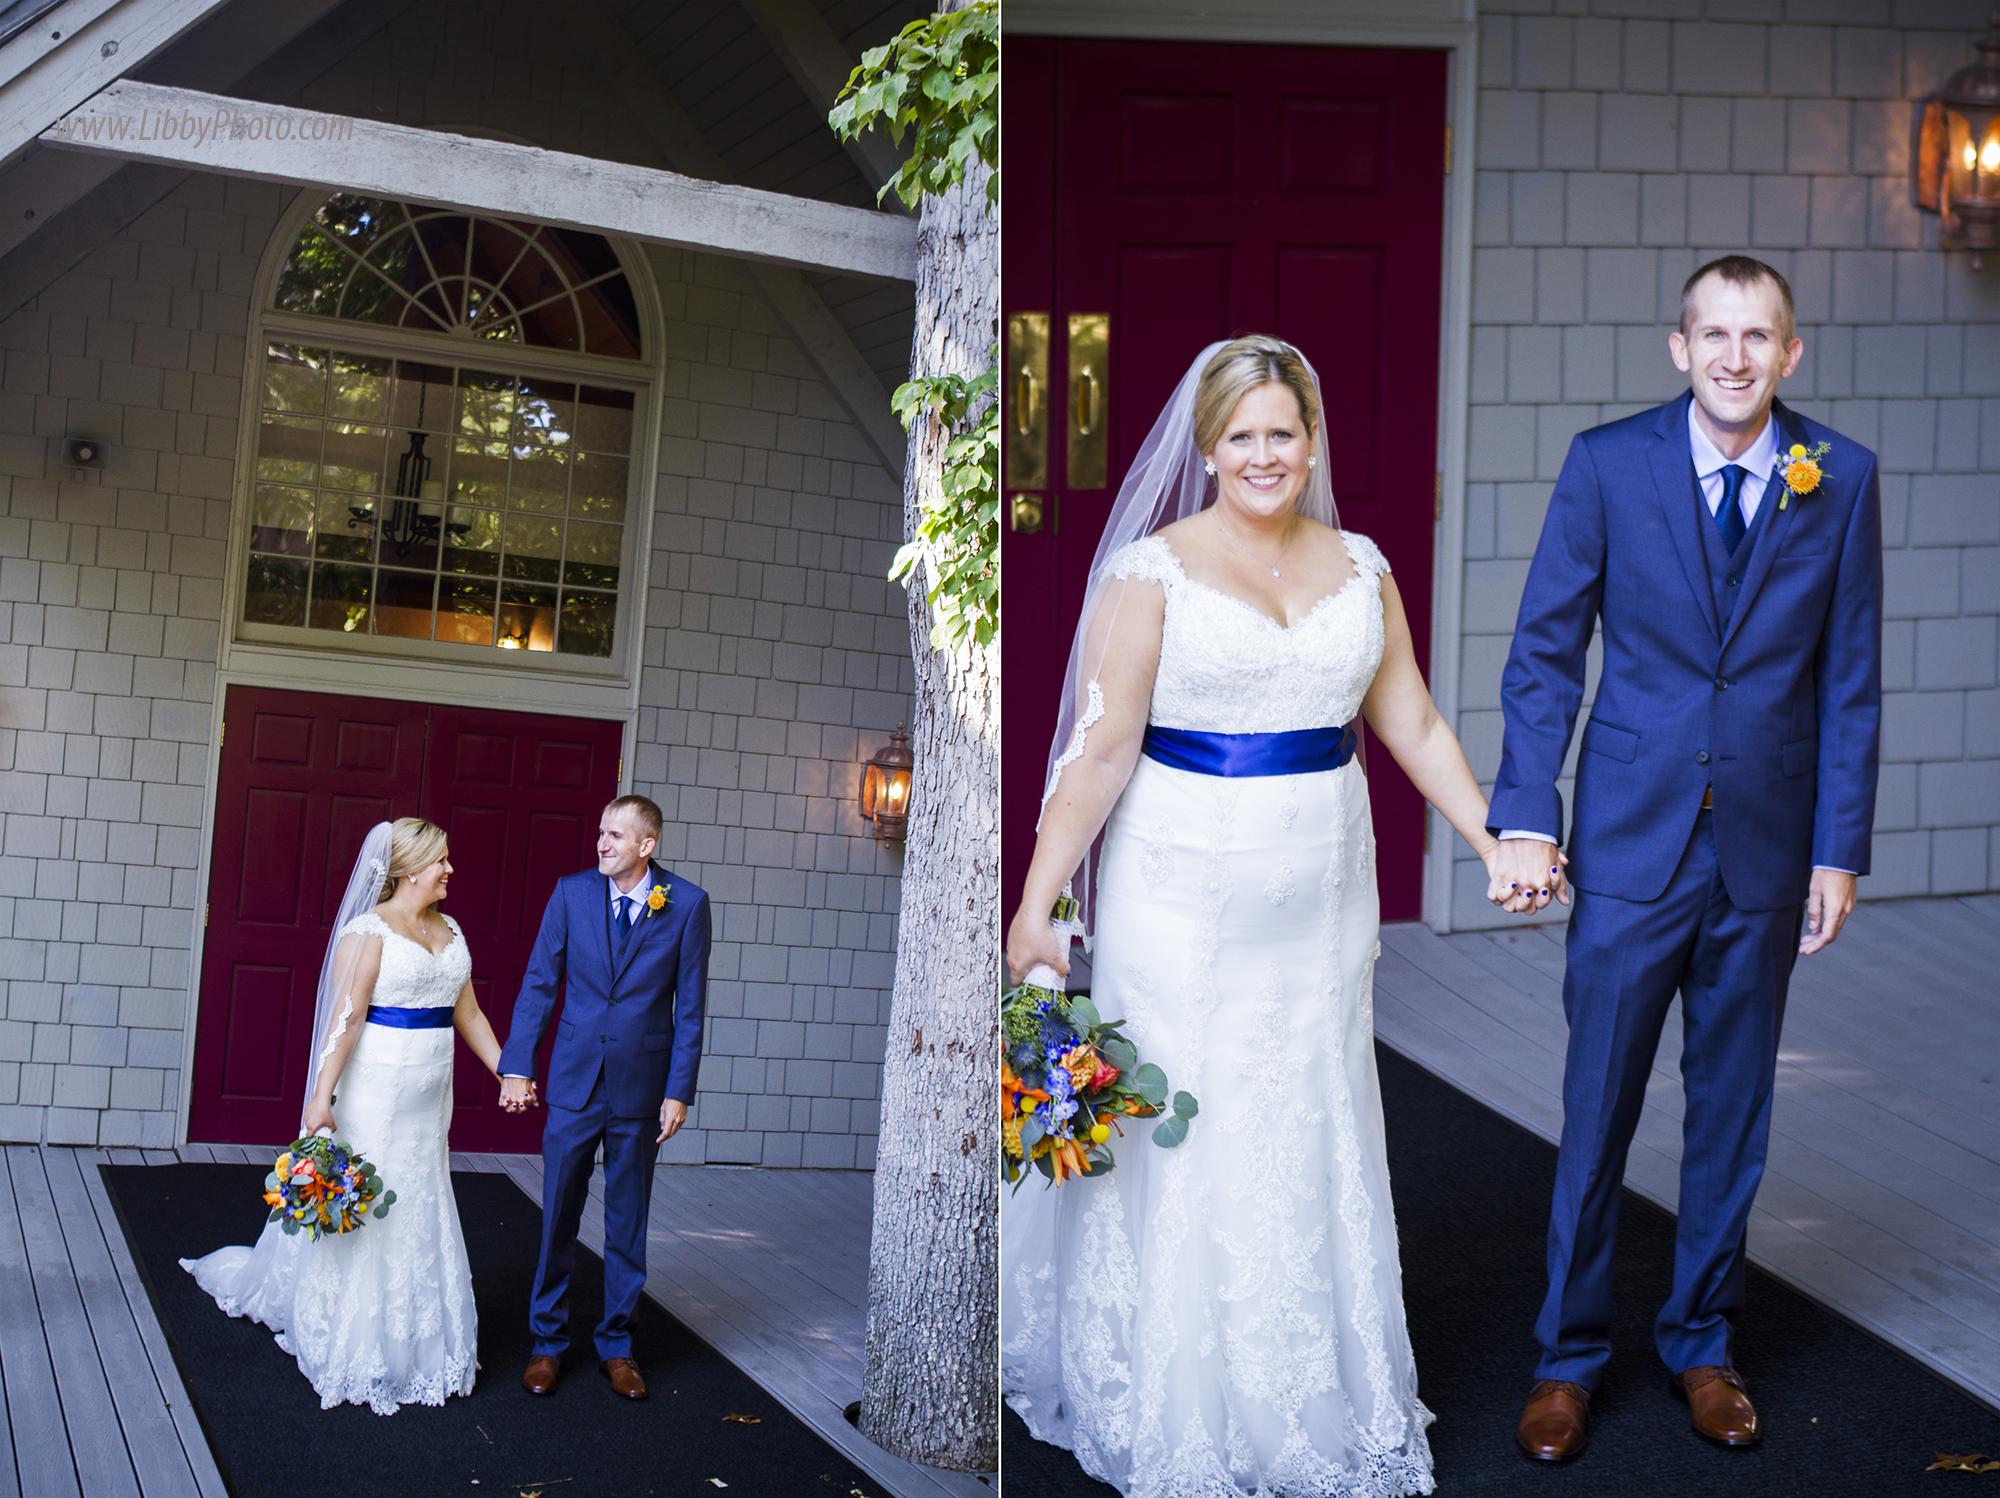 Atlanta wedding photography, Libbyphoto11 (27).jpg